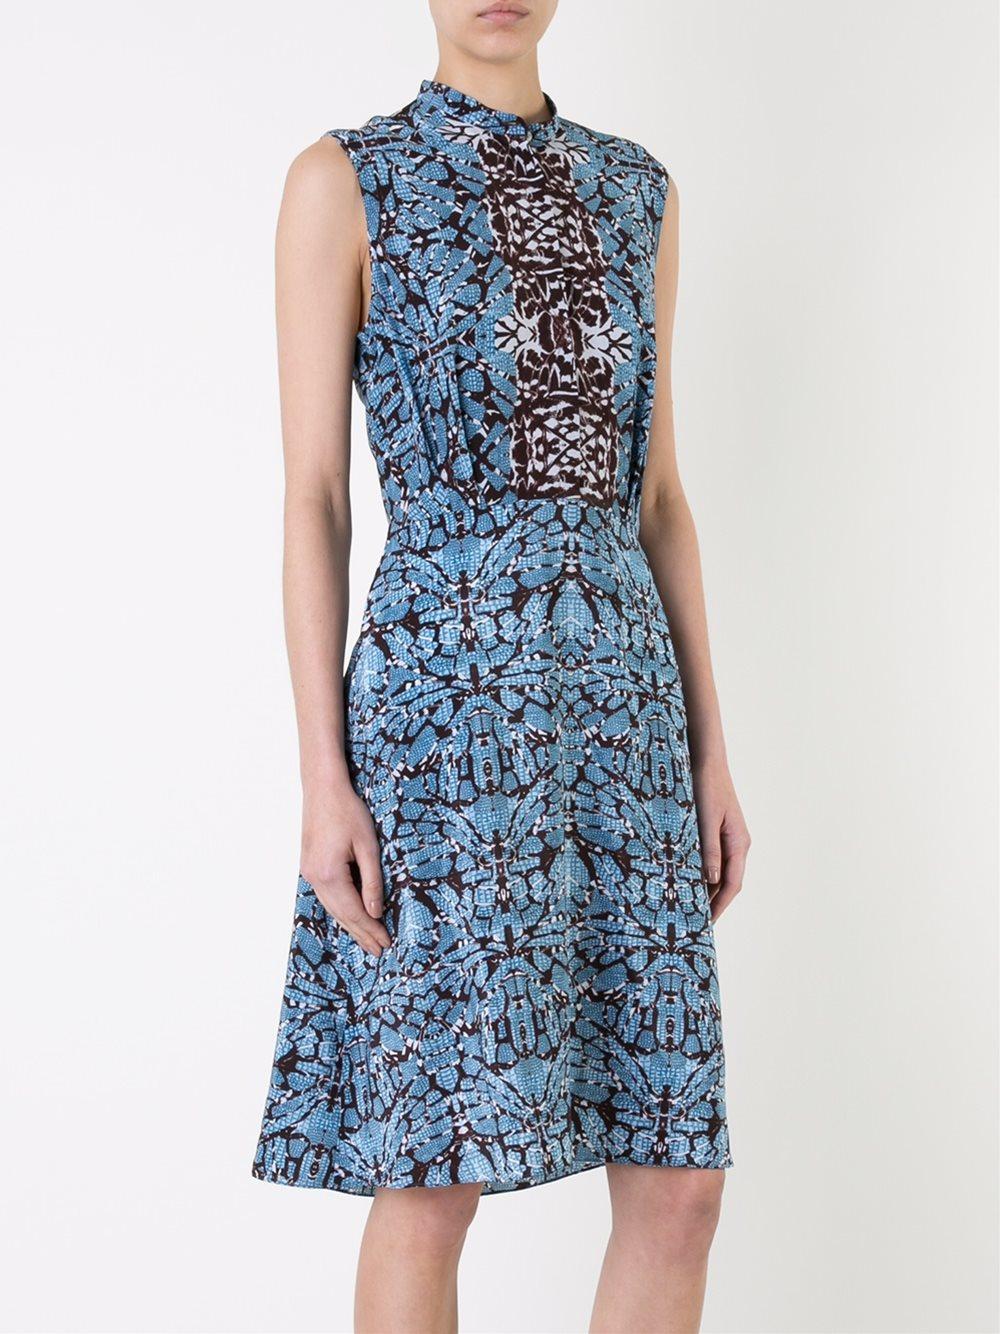 Lyst Scanlan Theodore Reptile Print Dress In Blue